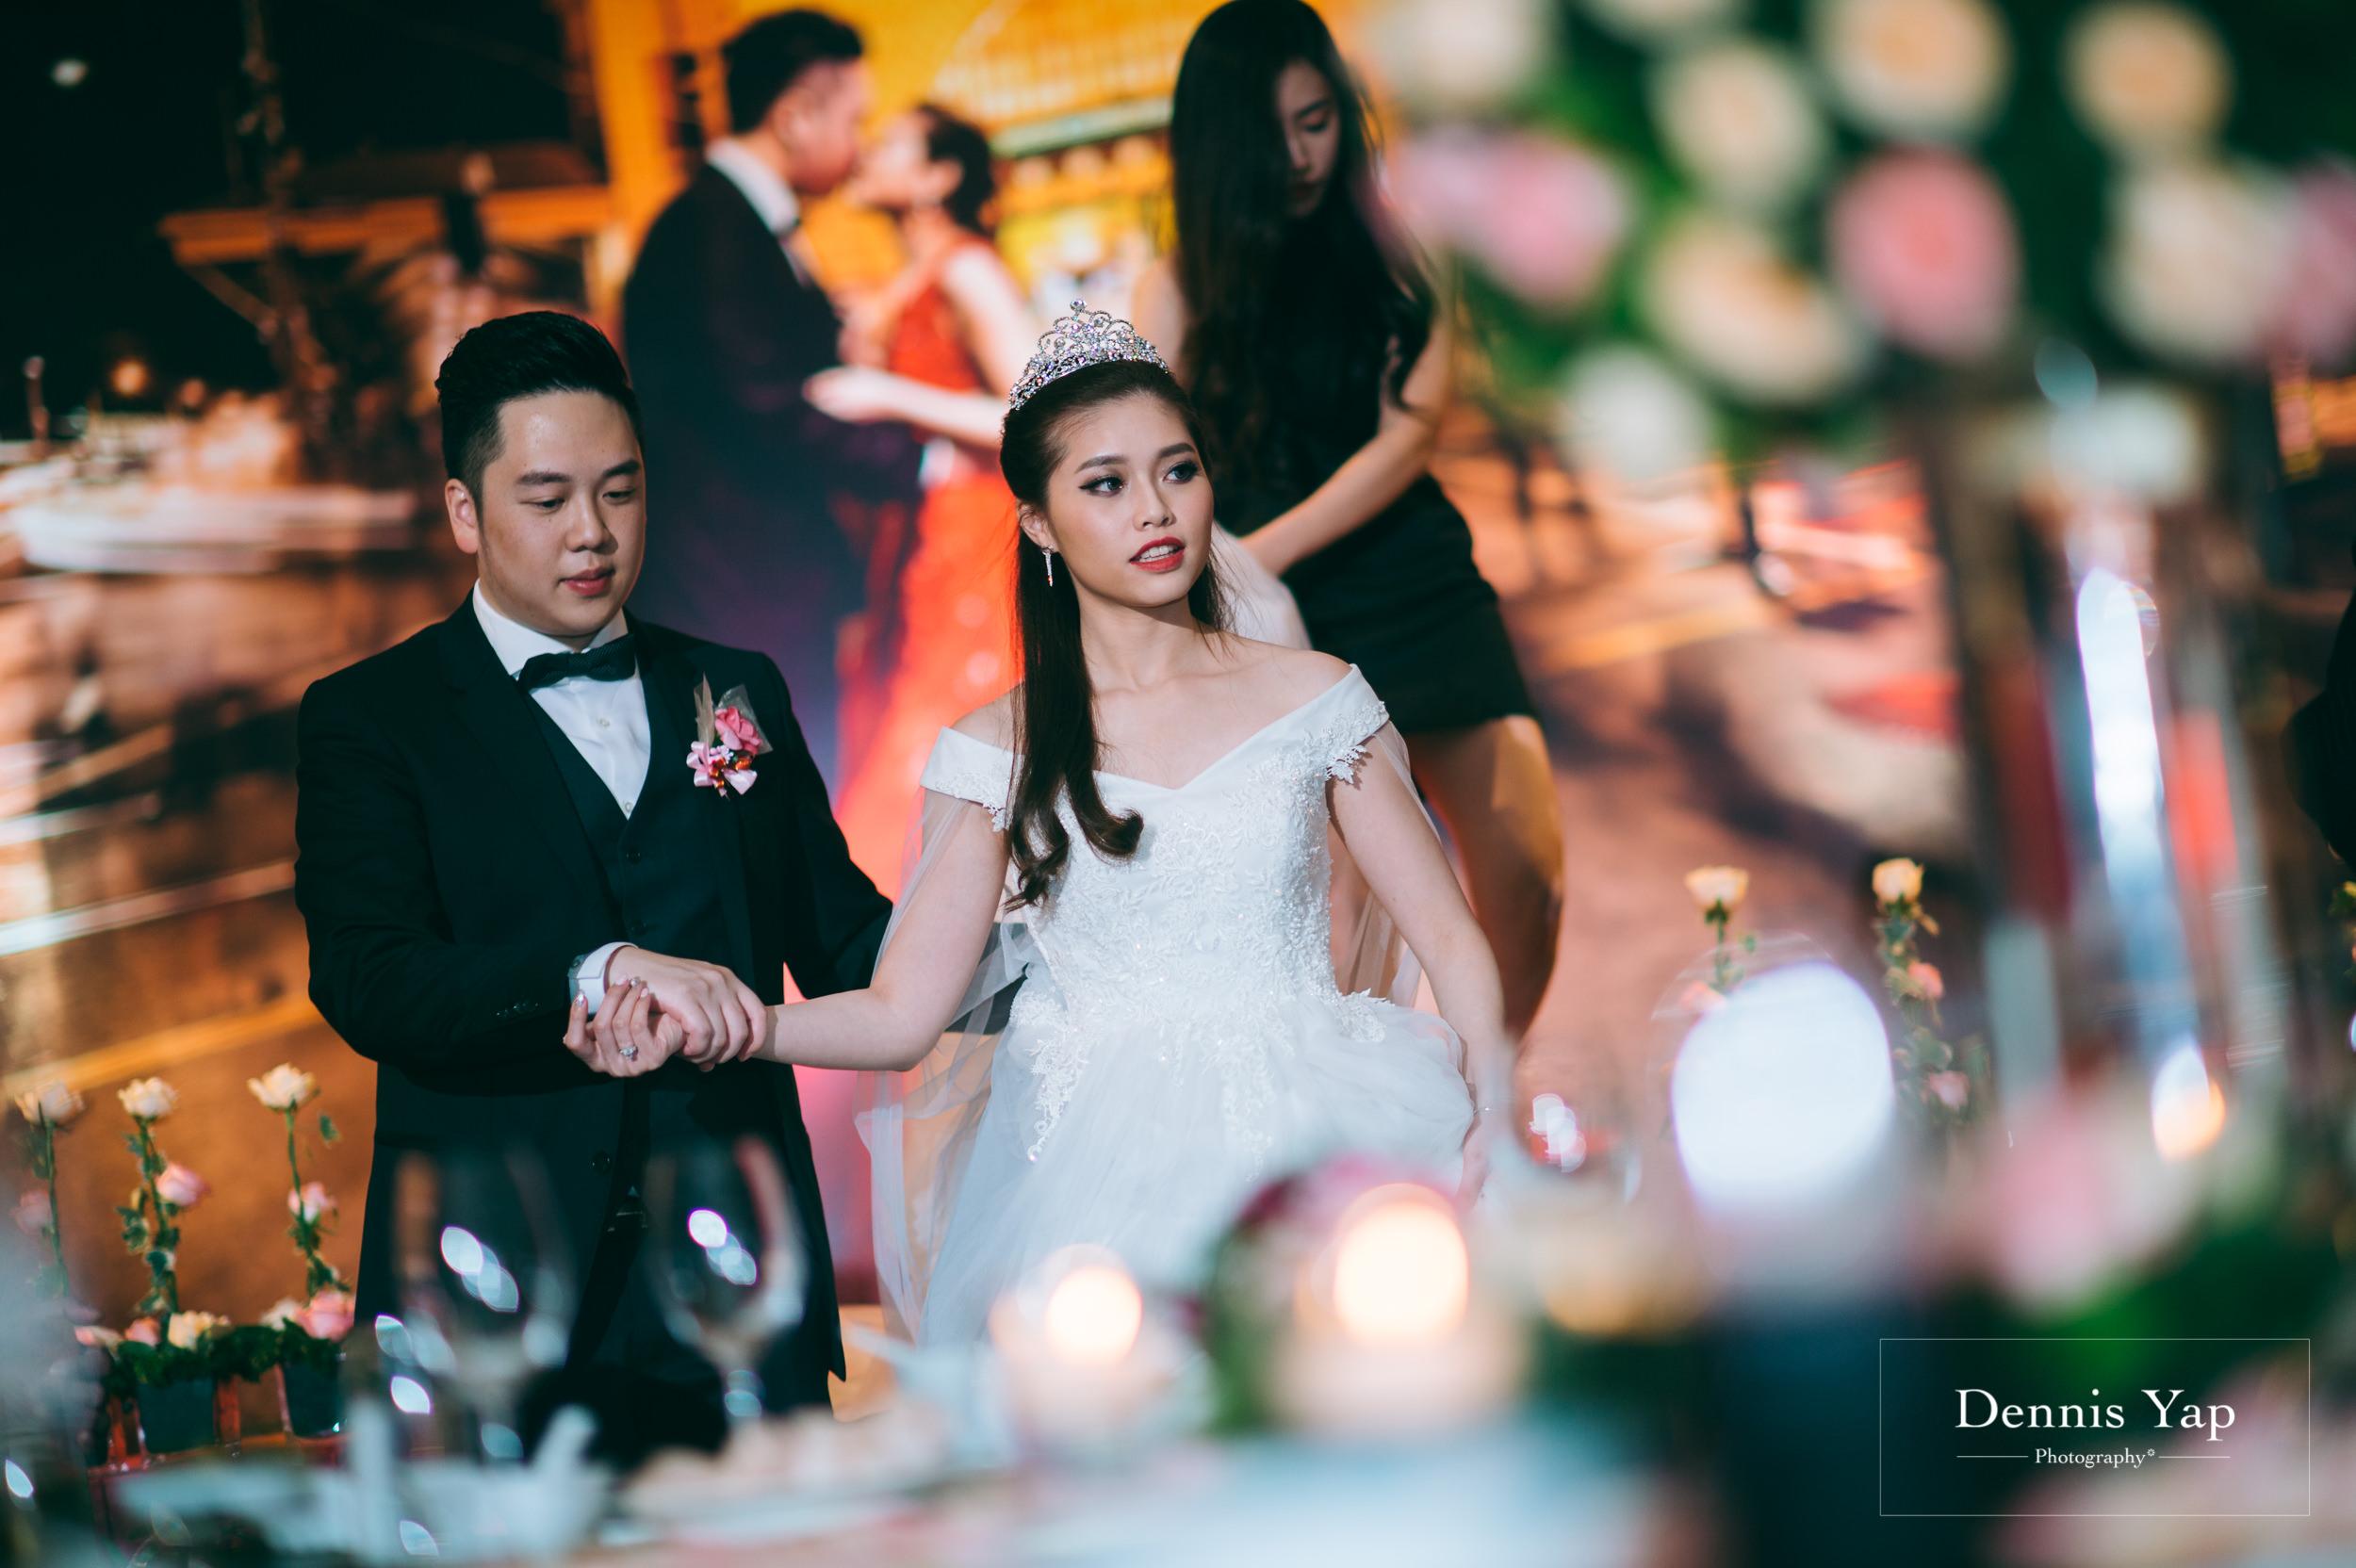 ivan constance wedding day renaissance hotel dennis yap photography-39.jpg